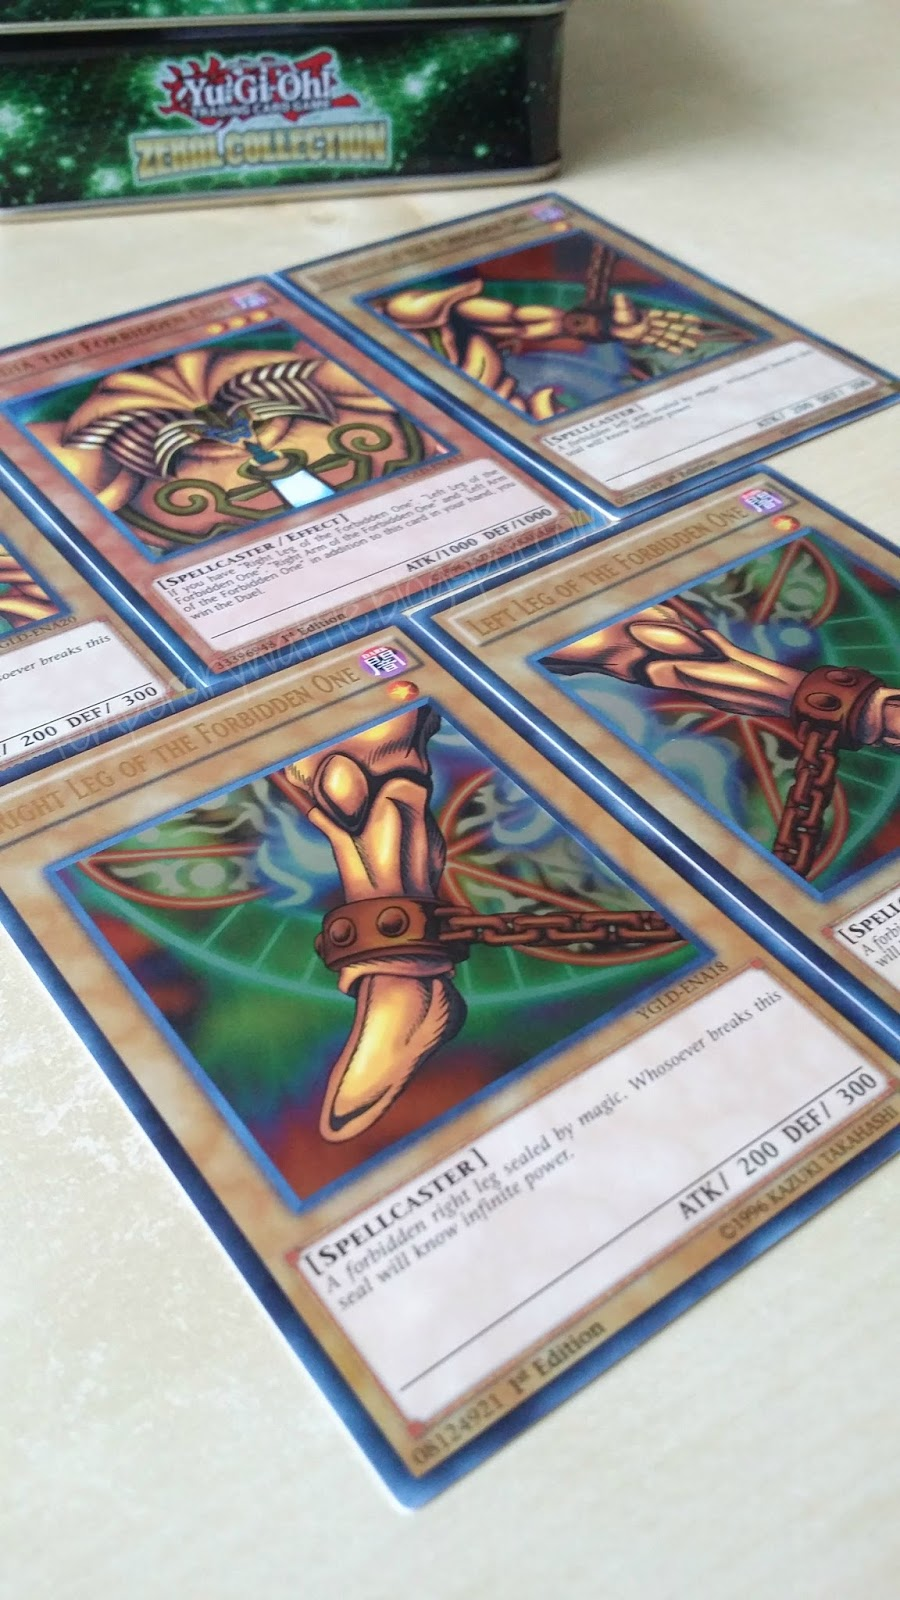 temporary waffle yugioh exodia the forbidden one full card set